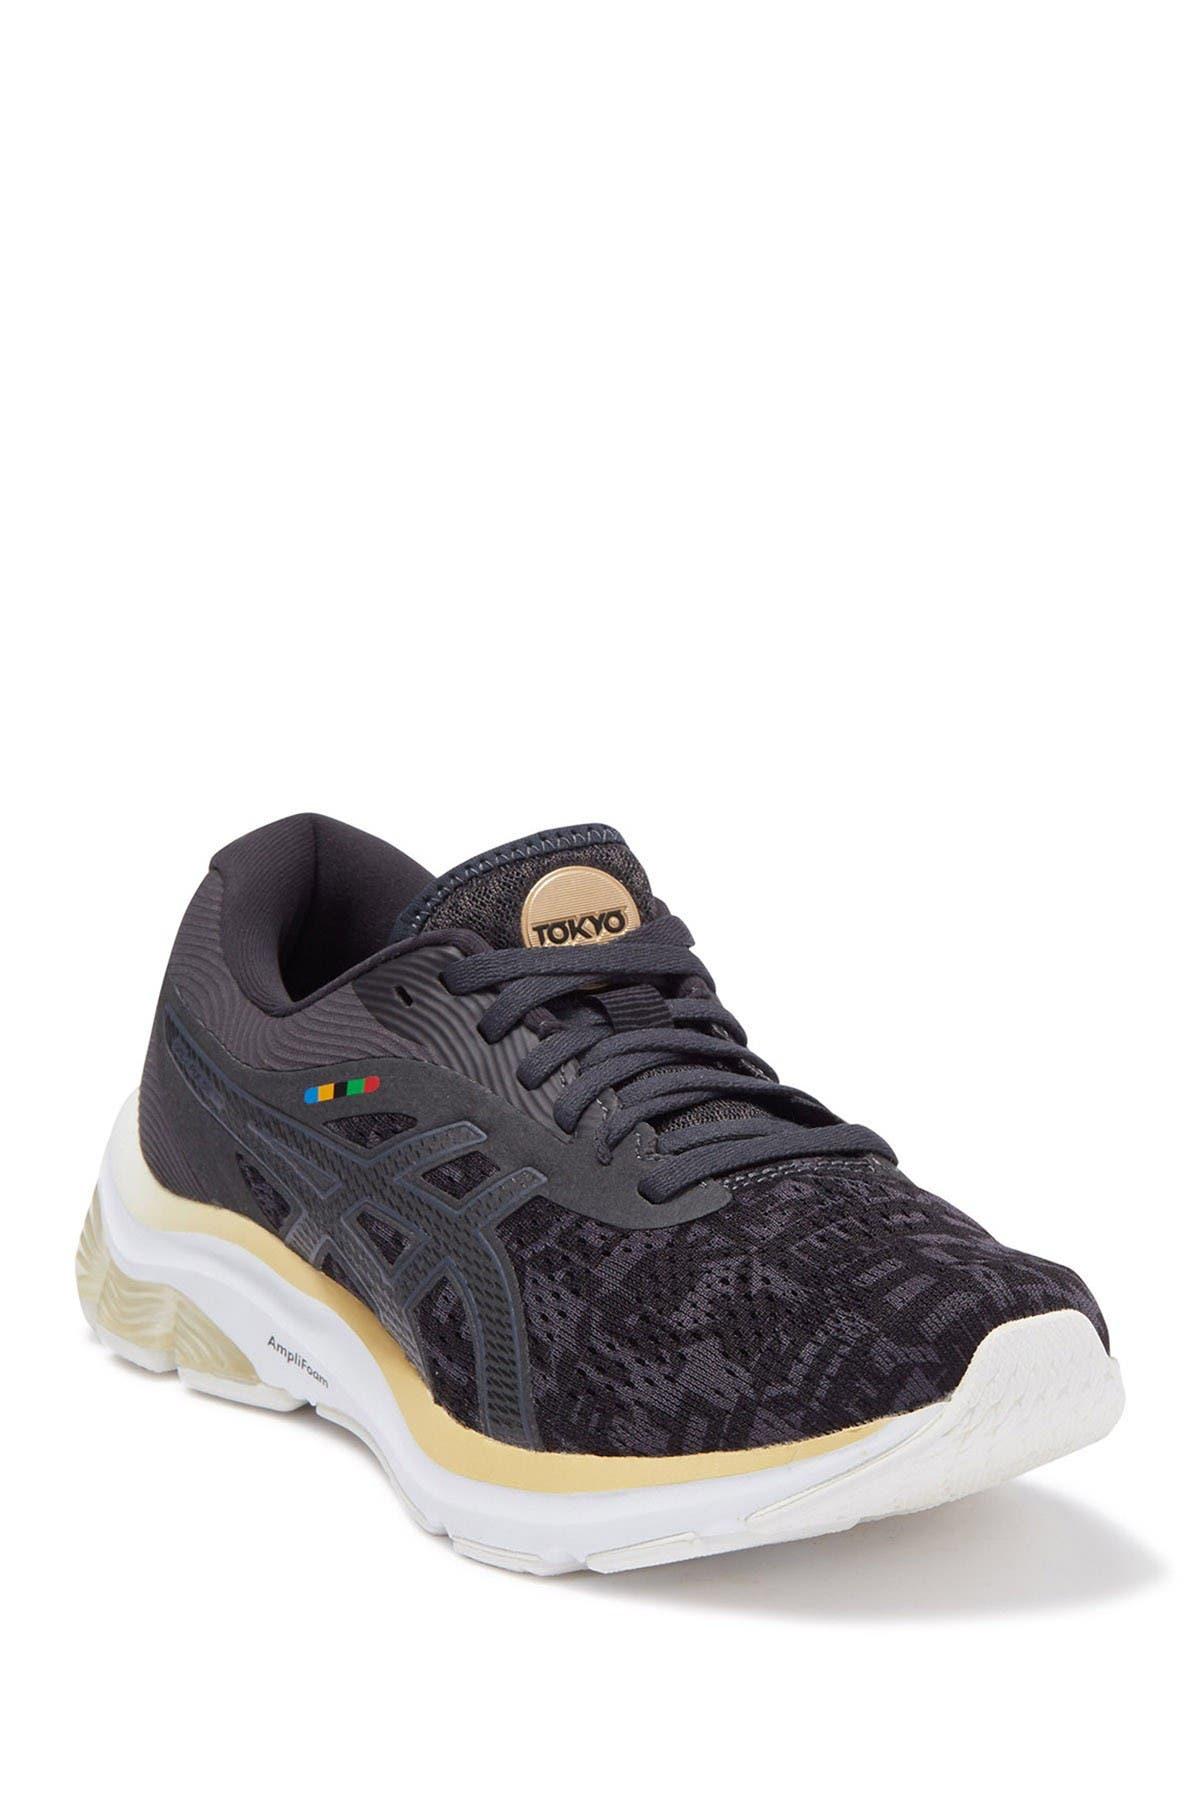 Image of ASICS GEL-Pulse 12 Sneaker